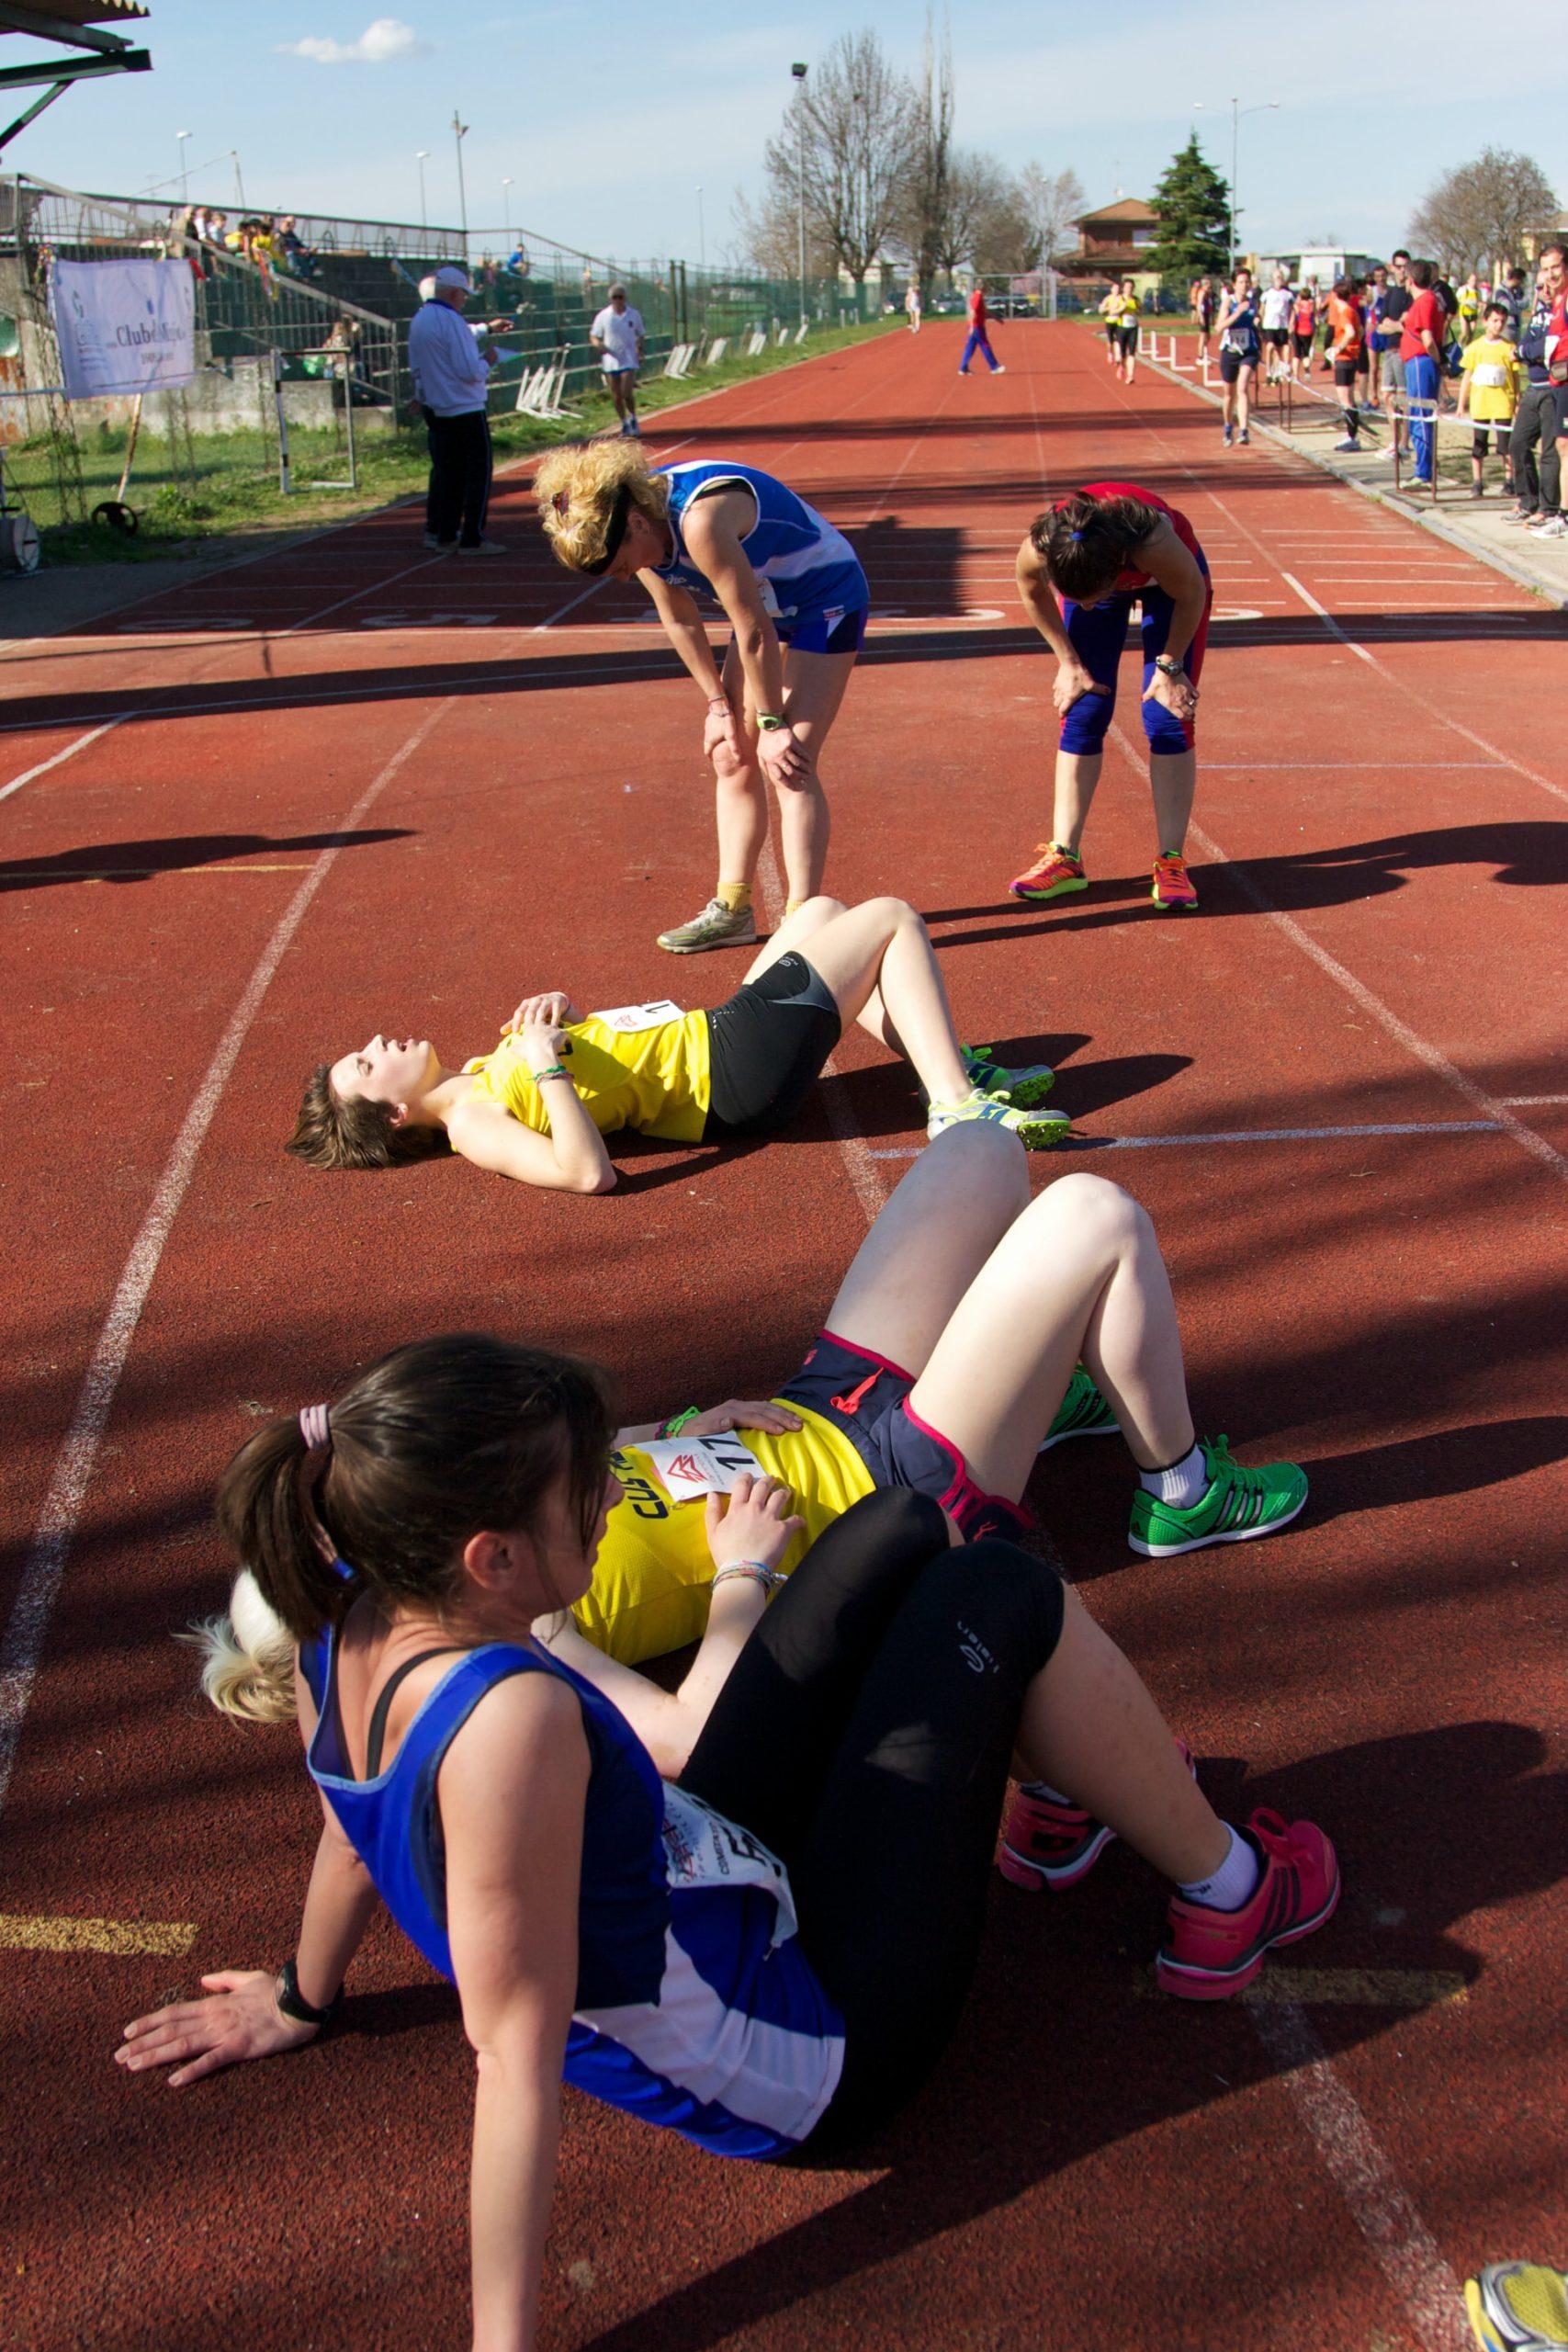 women finishing run race lay on run track exhausted